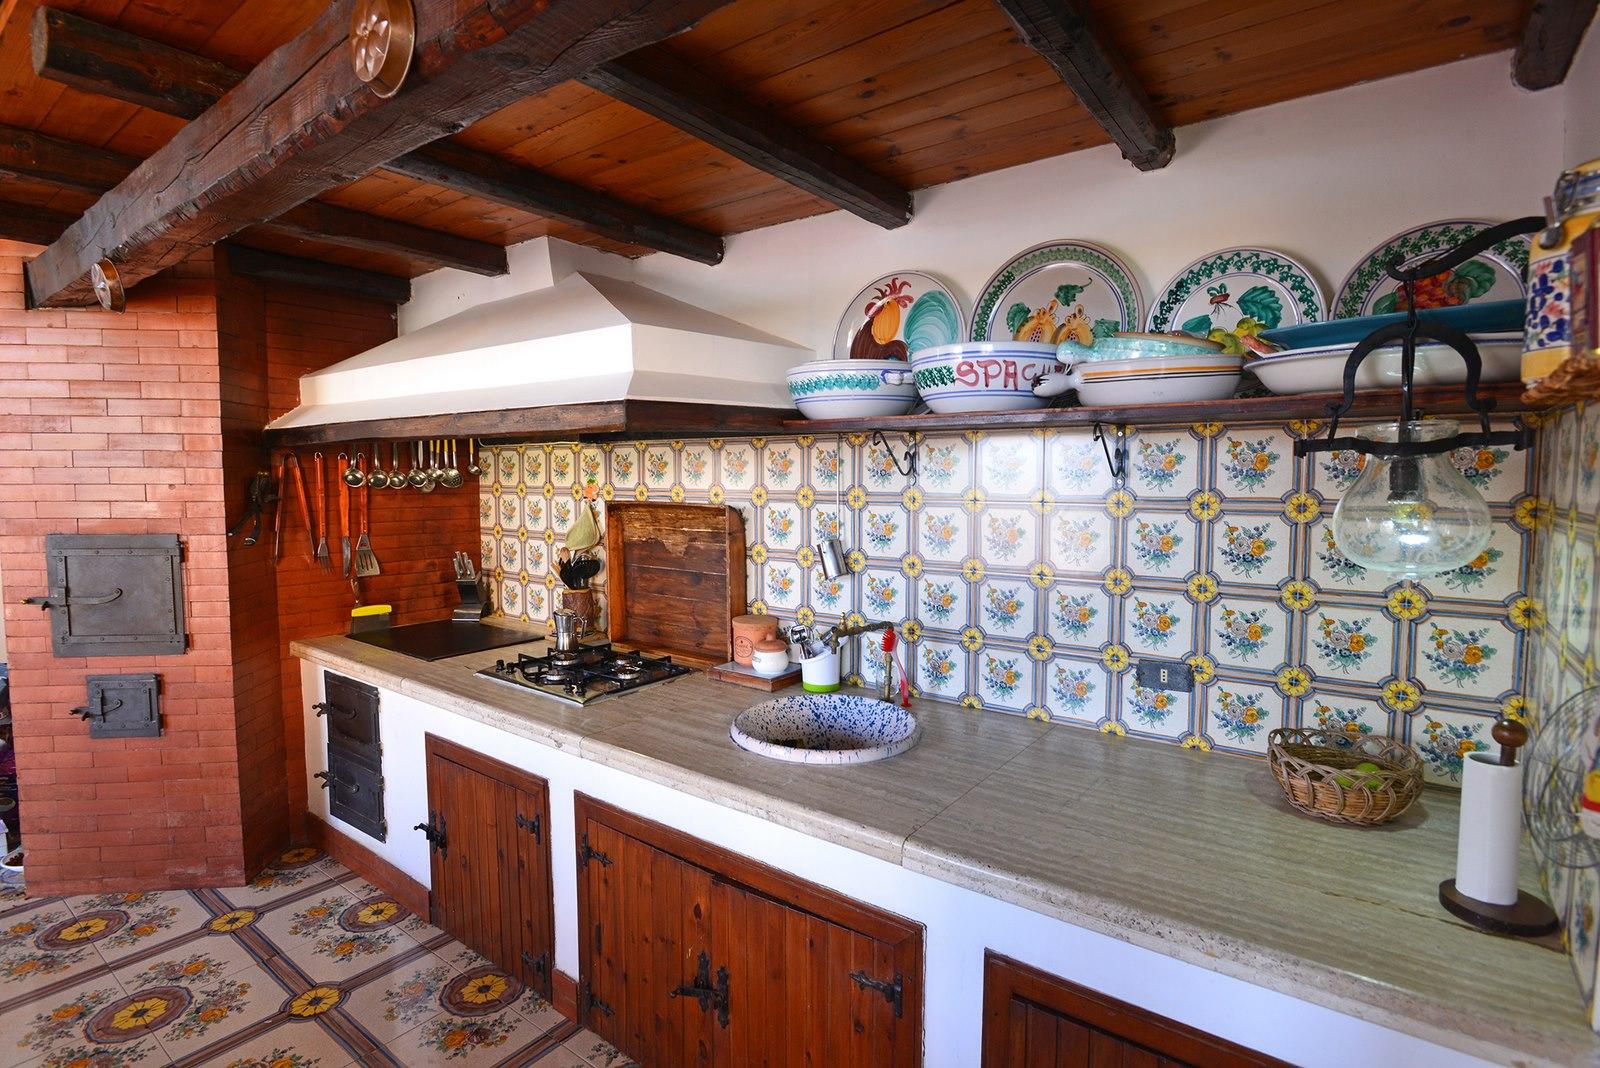 Maison de vacances Villa Casa (1531407), Solarino, Siracusa, Sicile, Italie, image 7